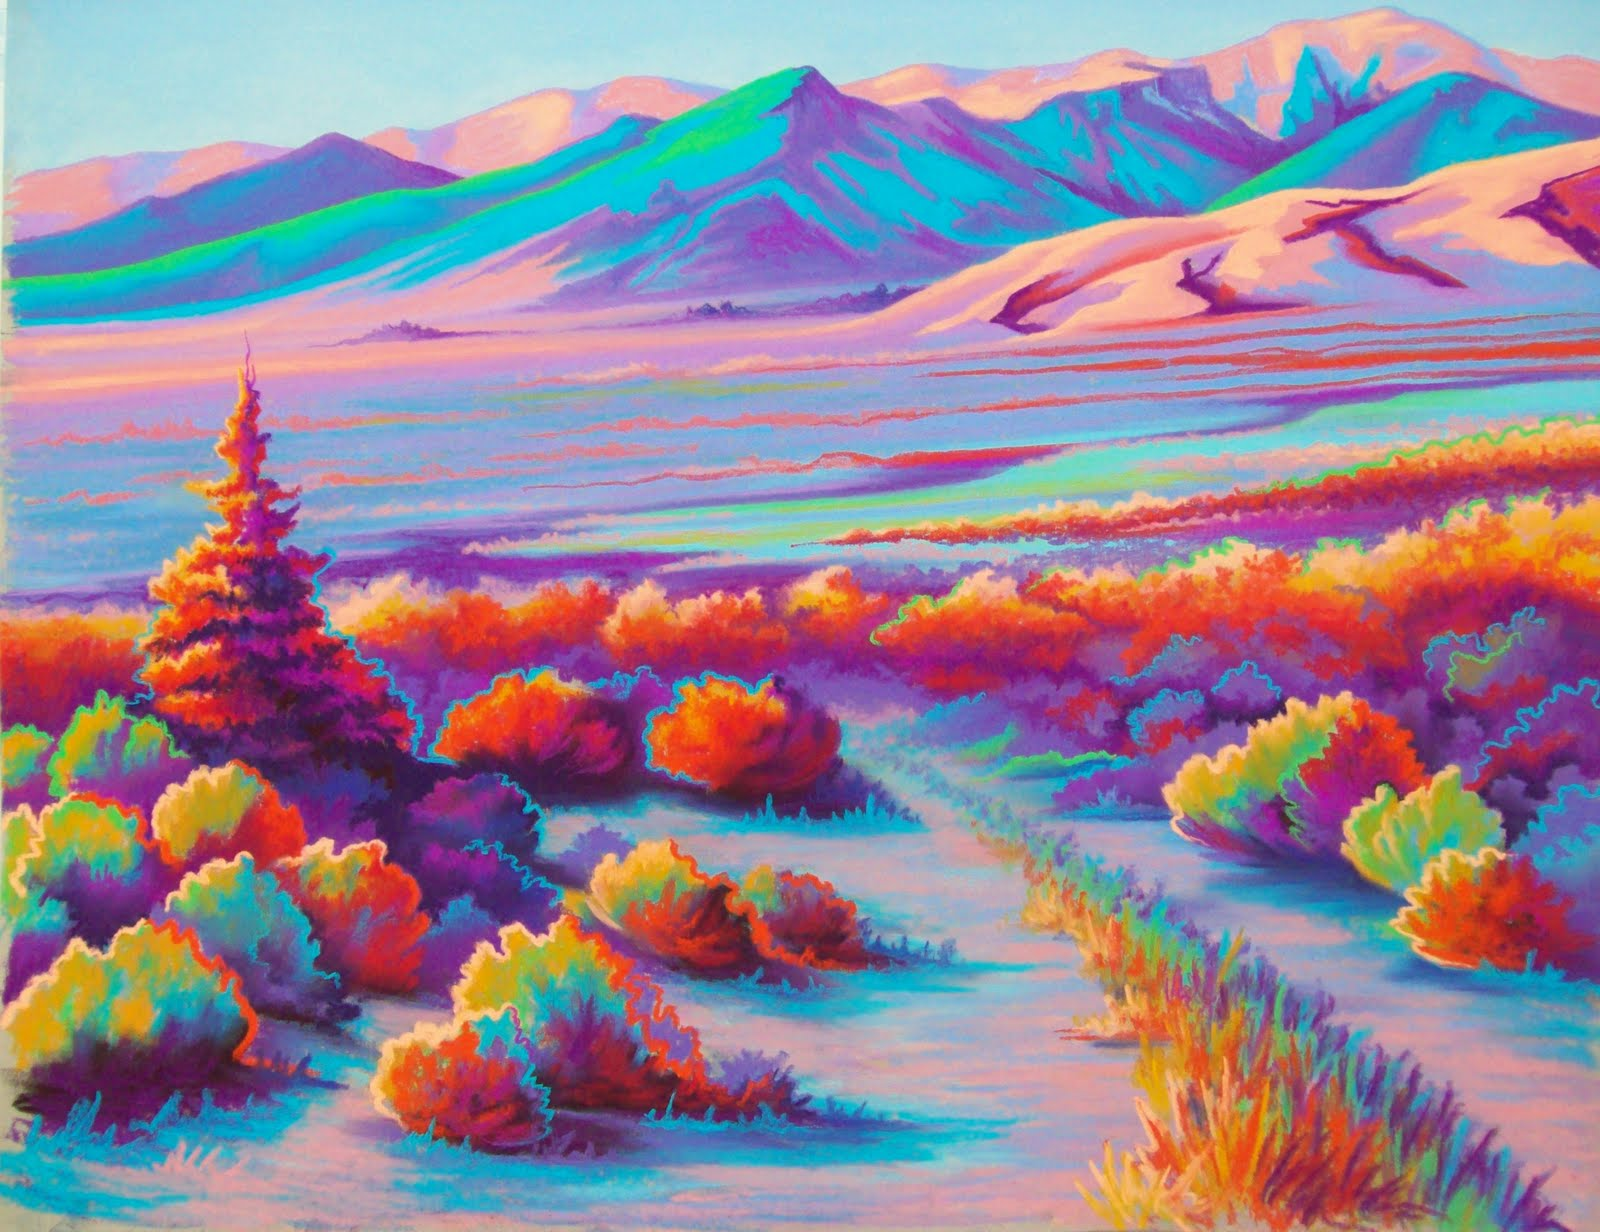 Jeanie Schlump Artworks: Vibrant Panorama